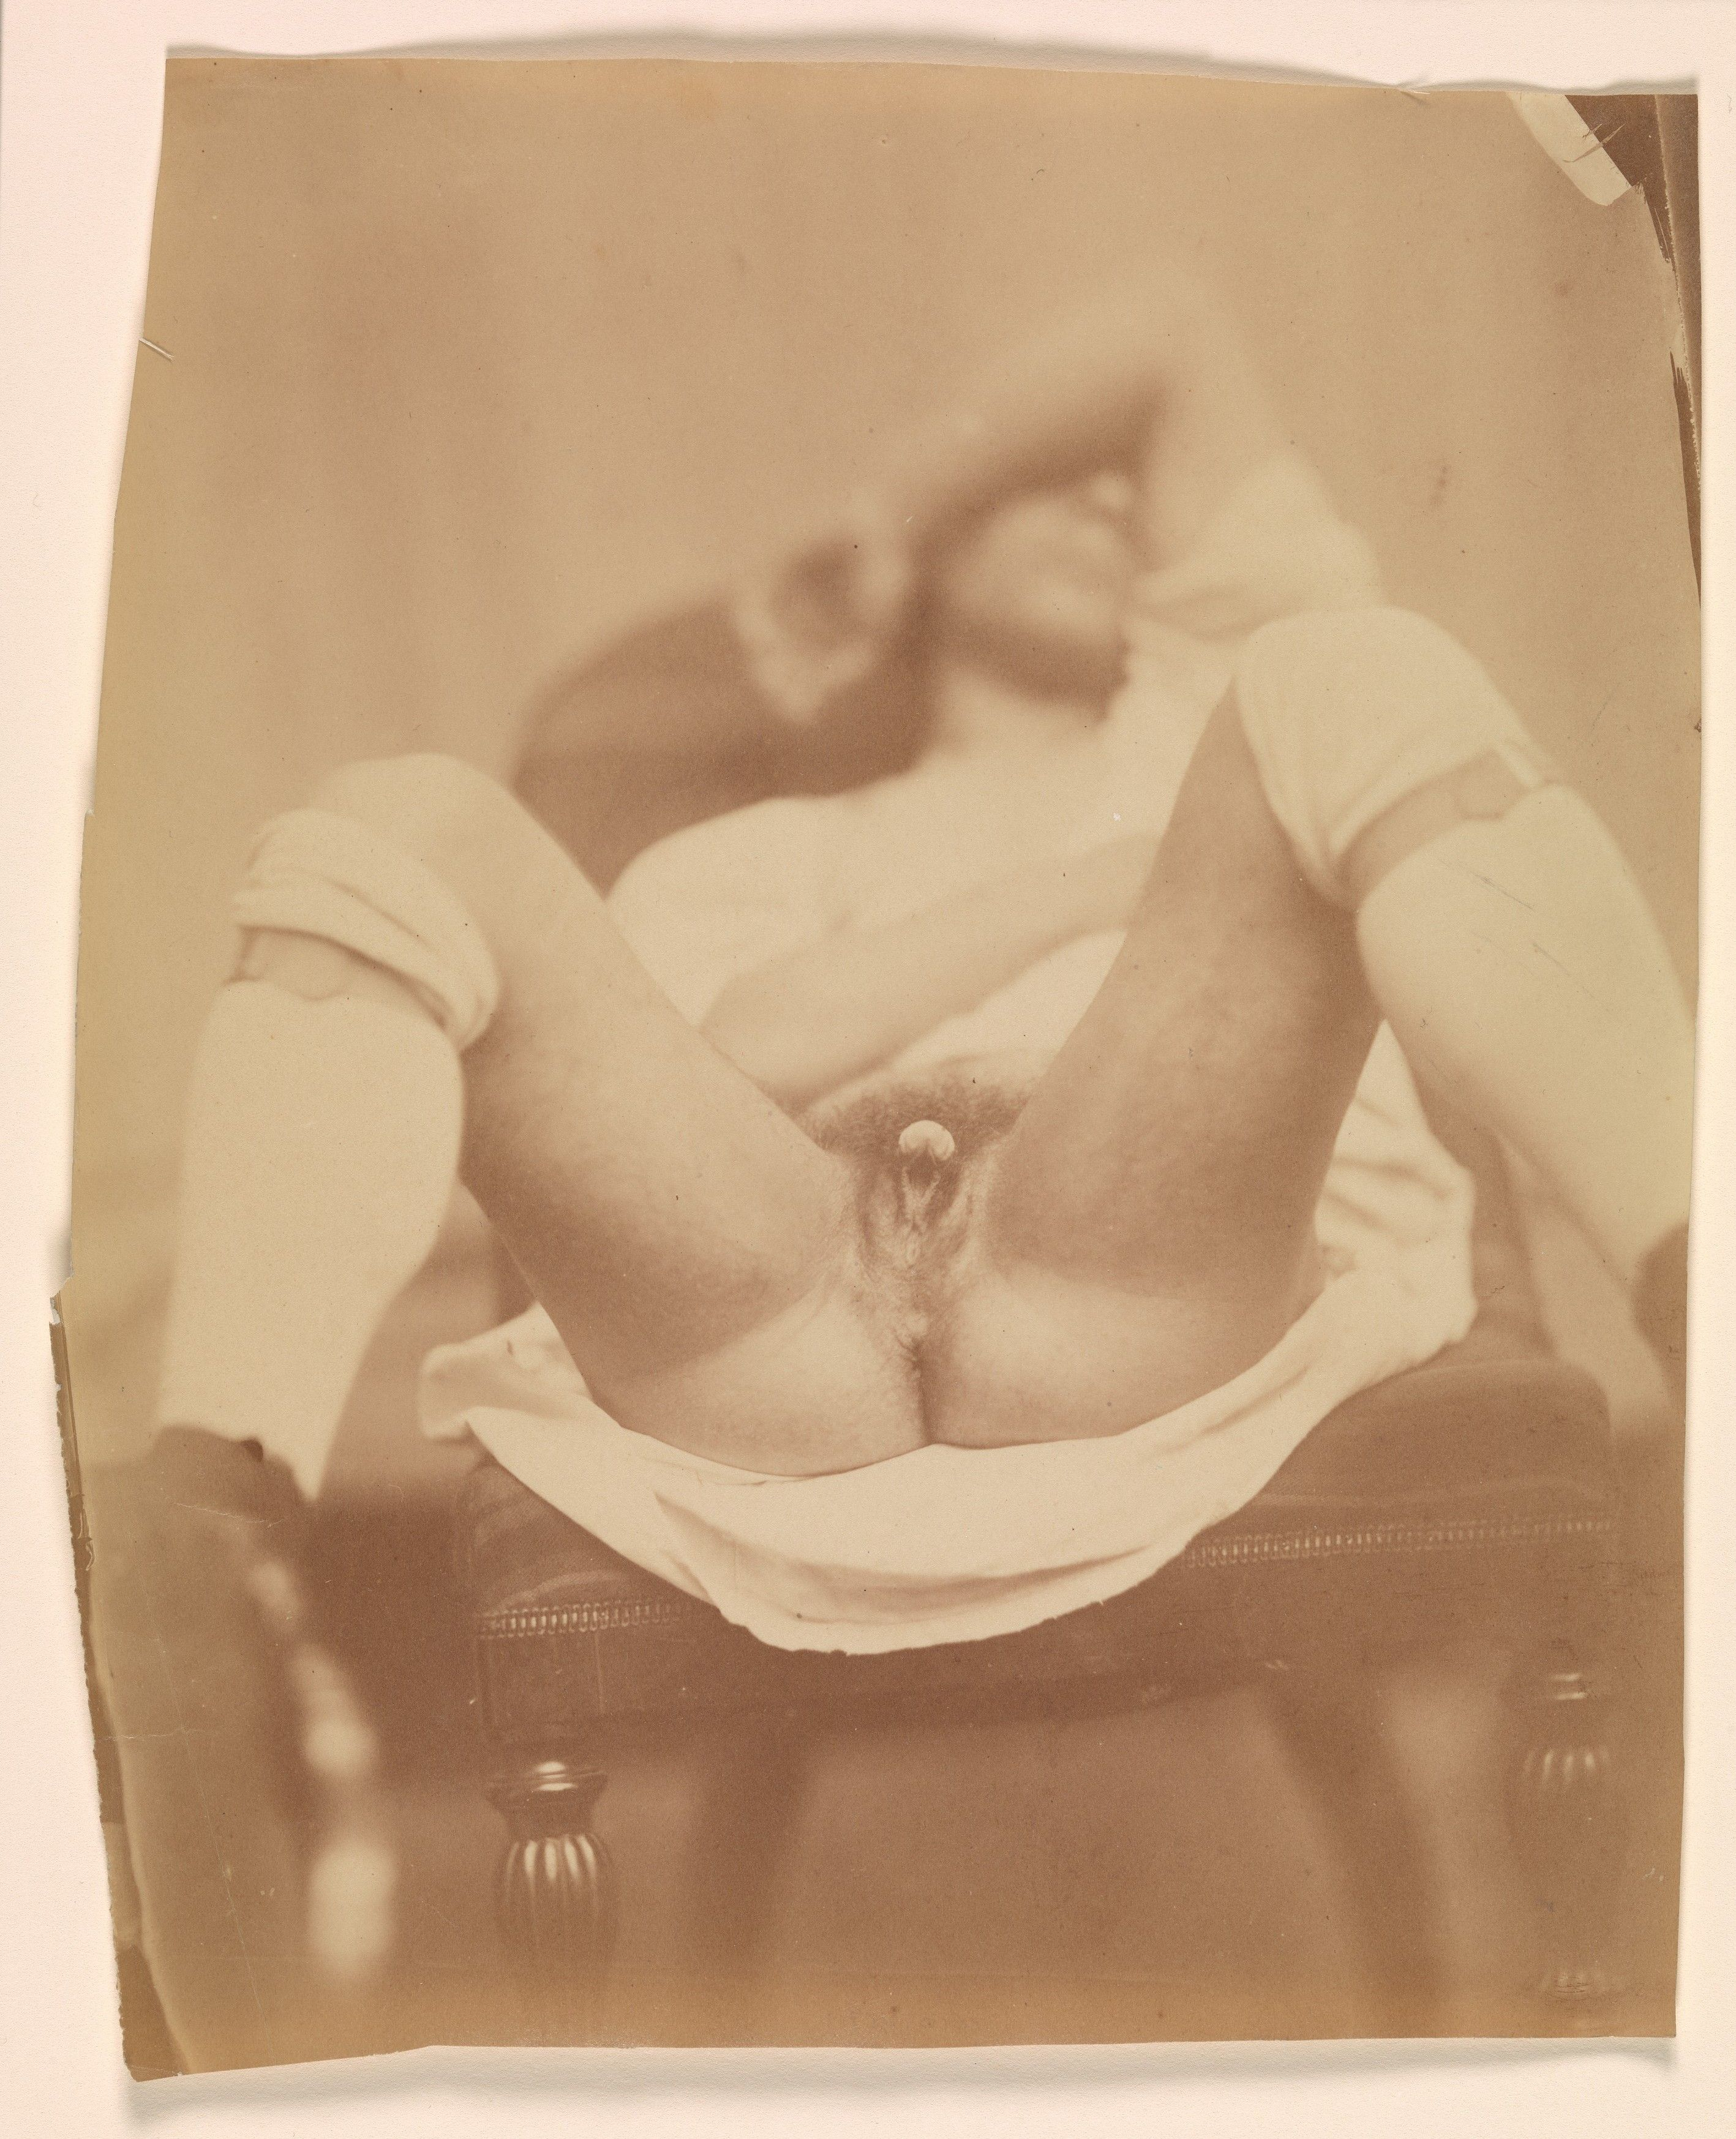 Hermaphrodite Genitals